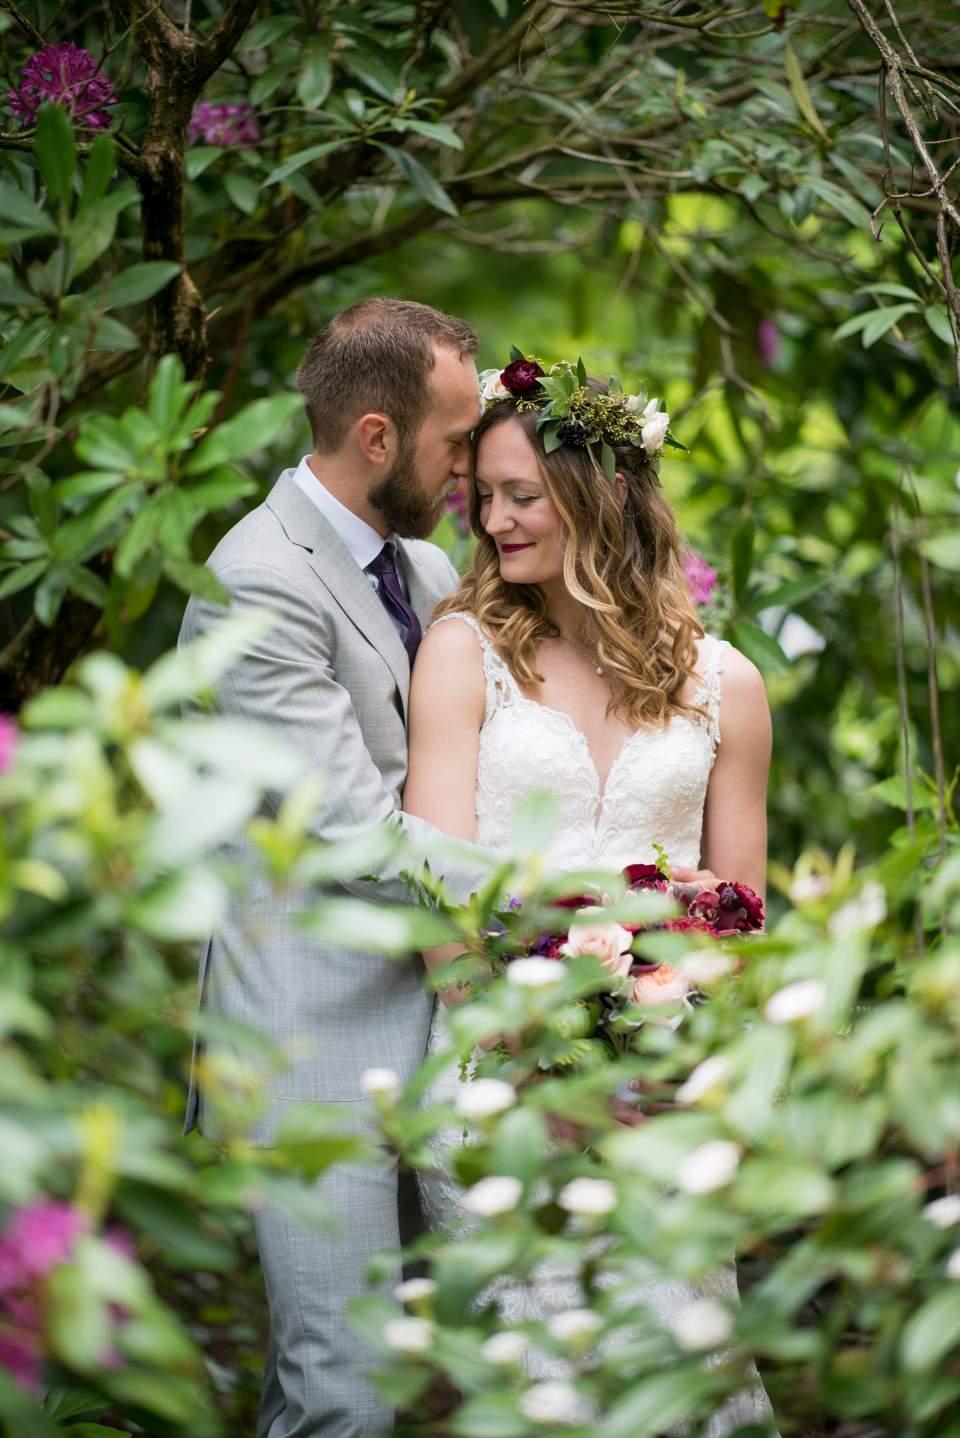 wedding photos at volunteer park